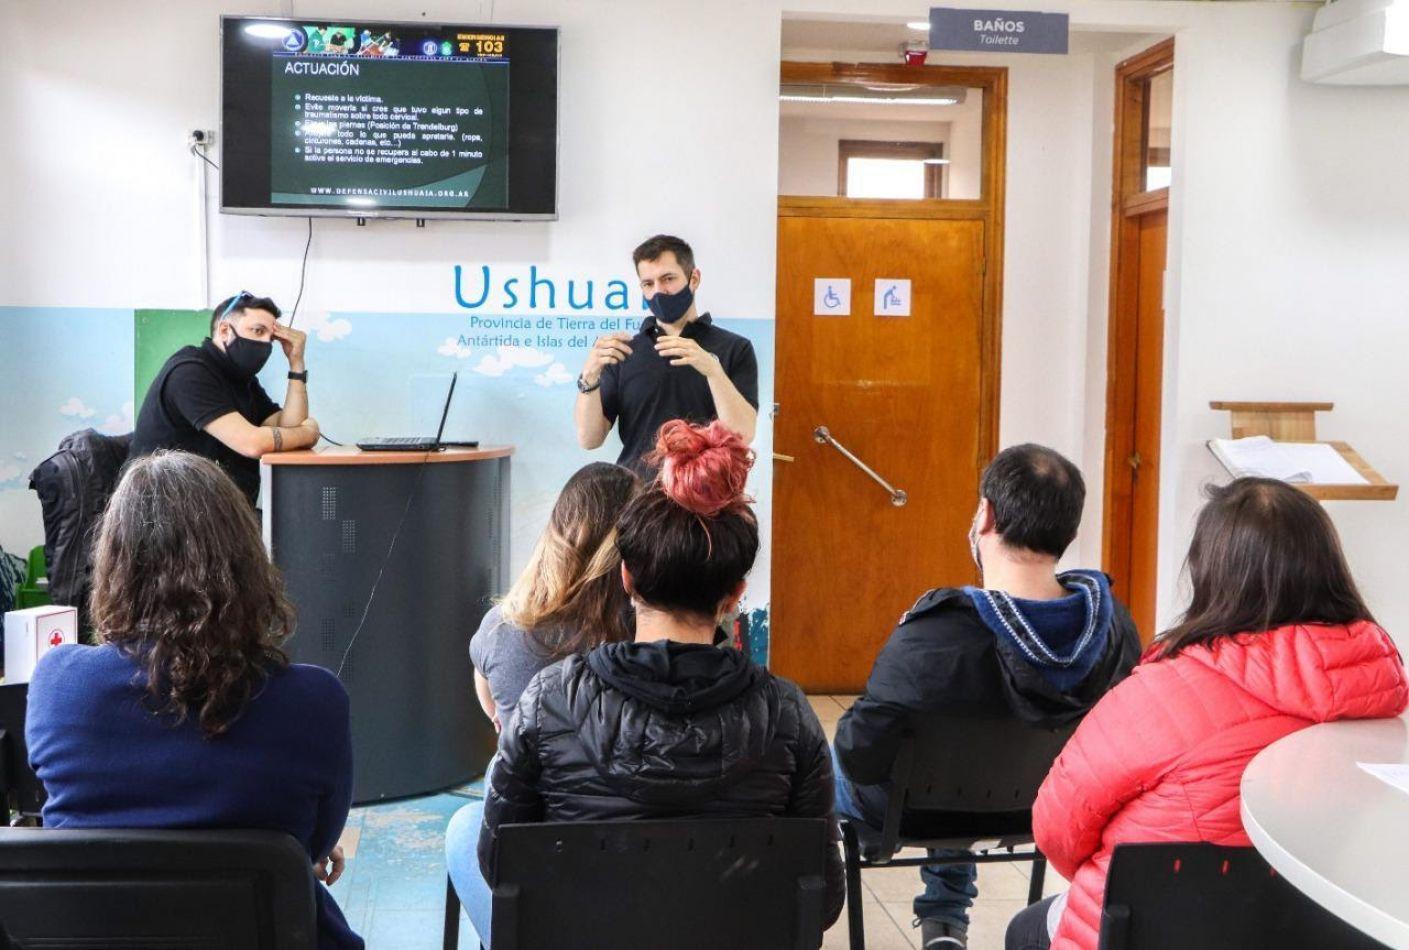 Turismo de Ushuaia capacitó a su personal sobre RCP a través de Defensa Civil